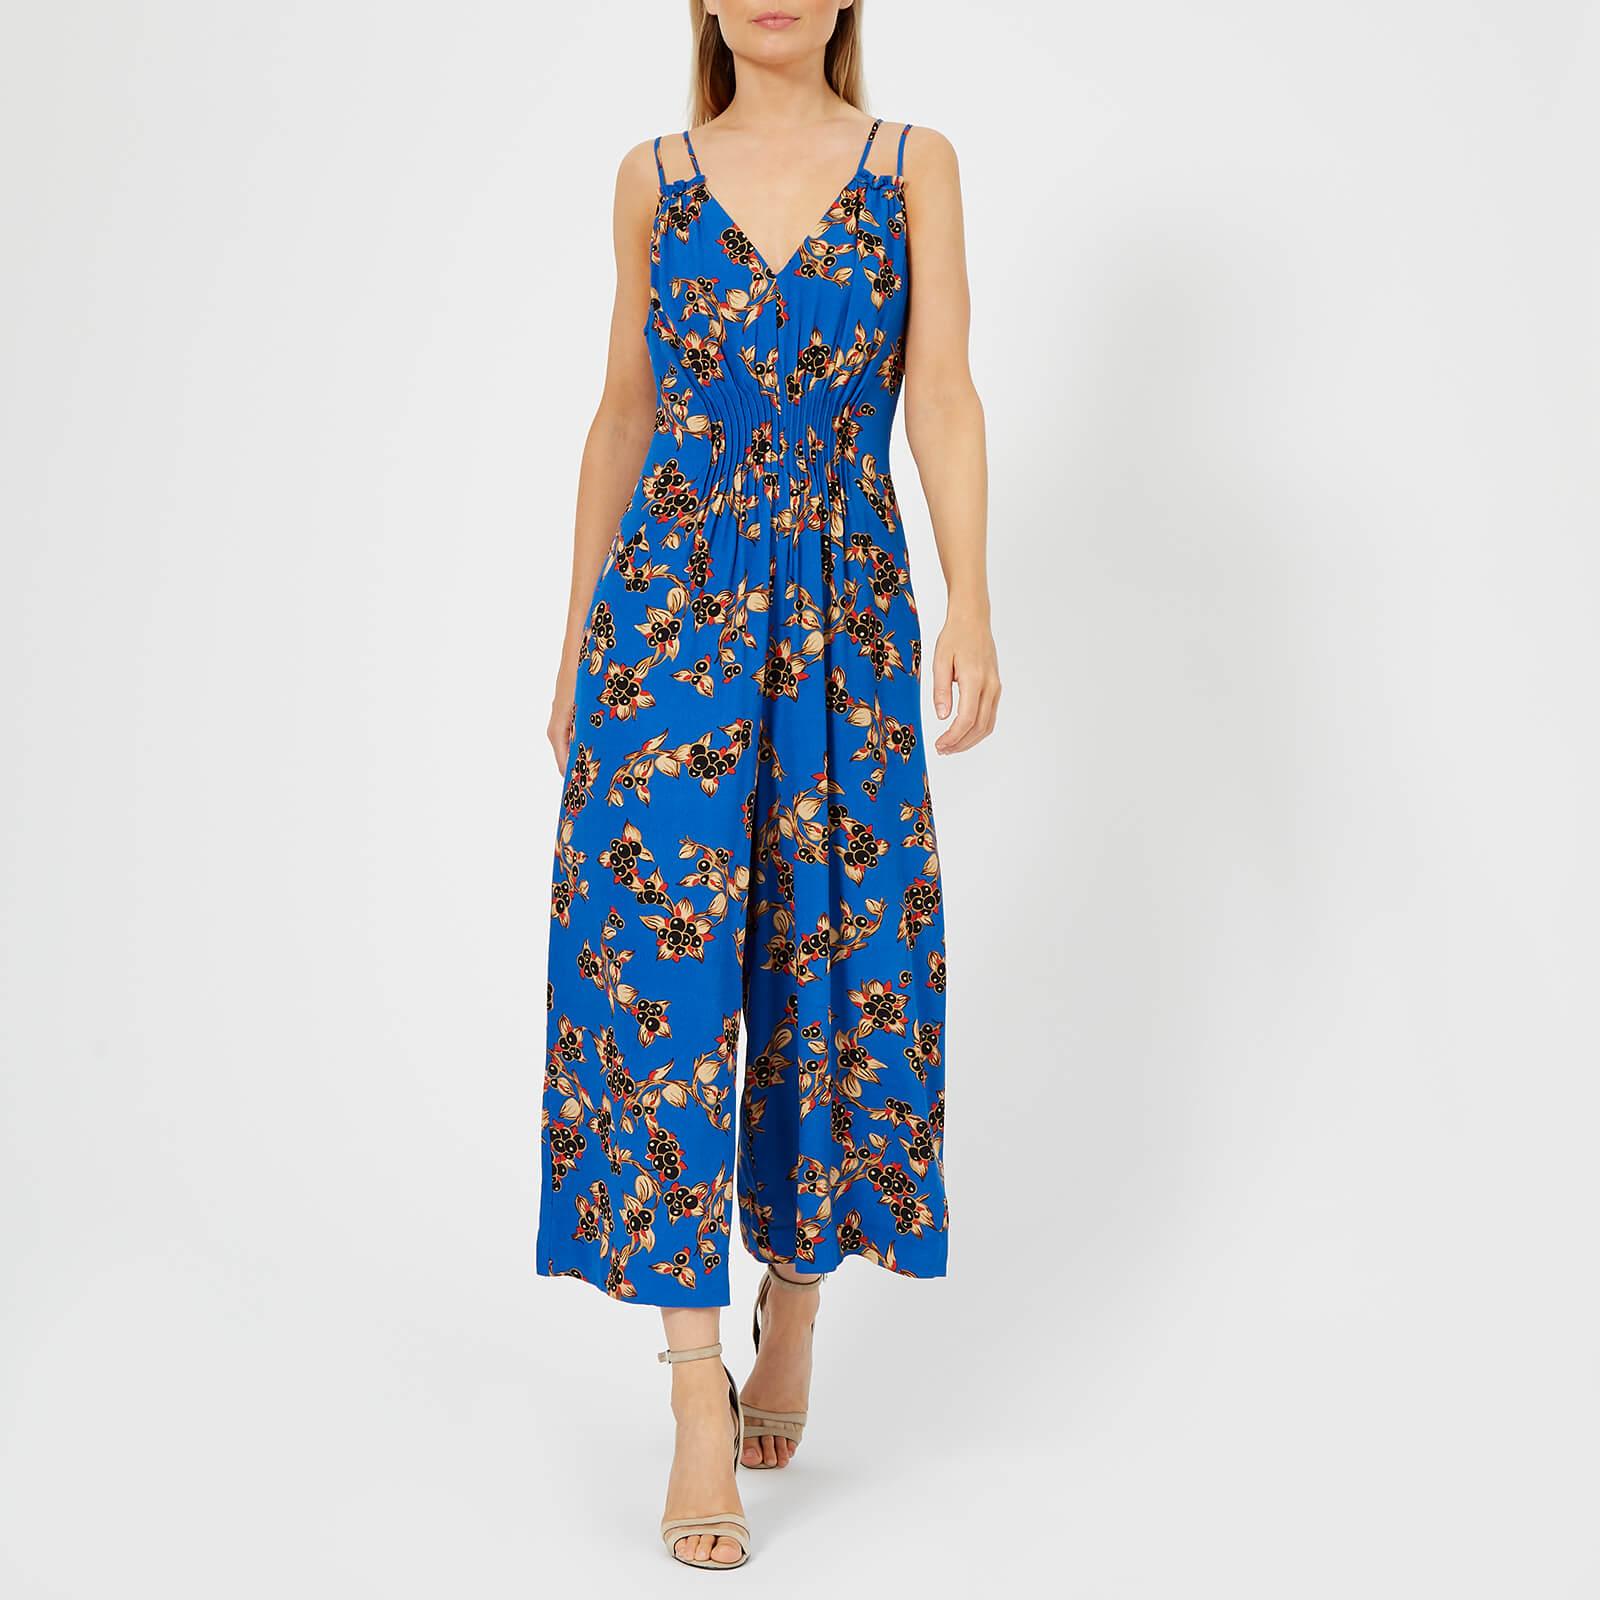 957937b940 Whistles Women s Armelle Capri Print Jumpsuit - Blue Multi Womens Clothing